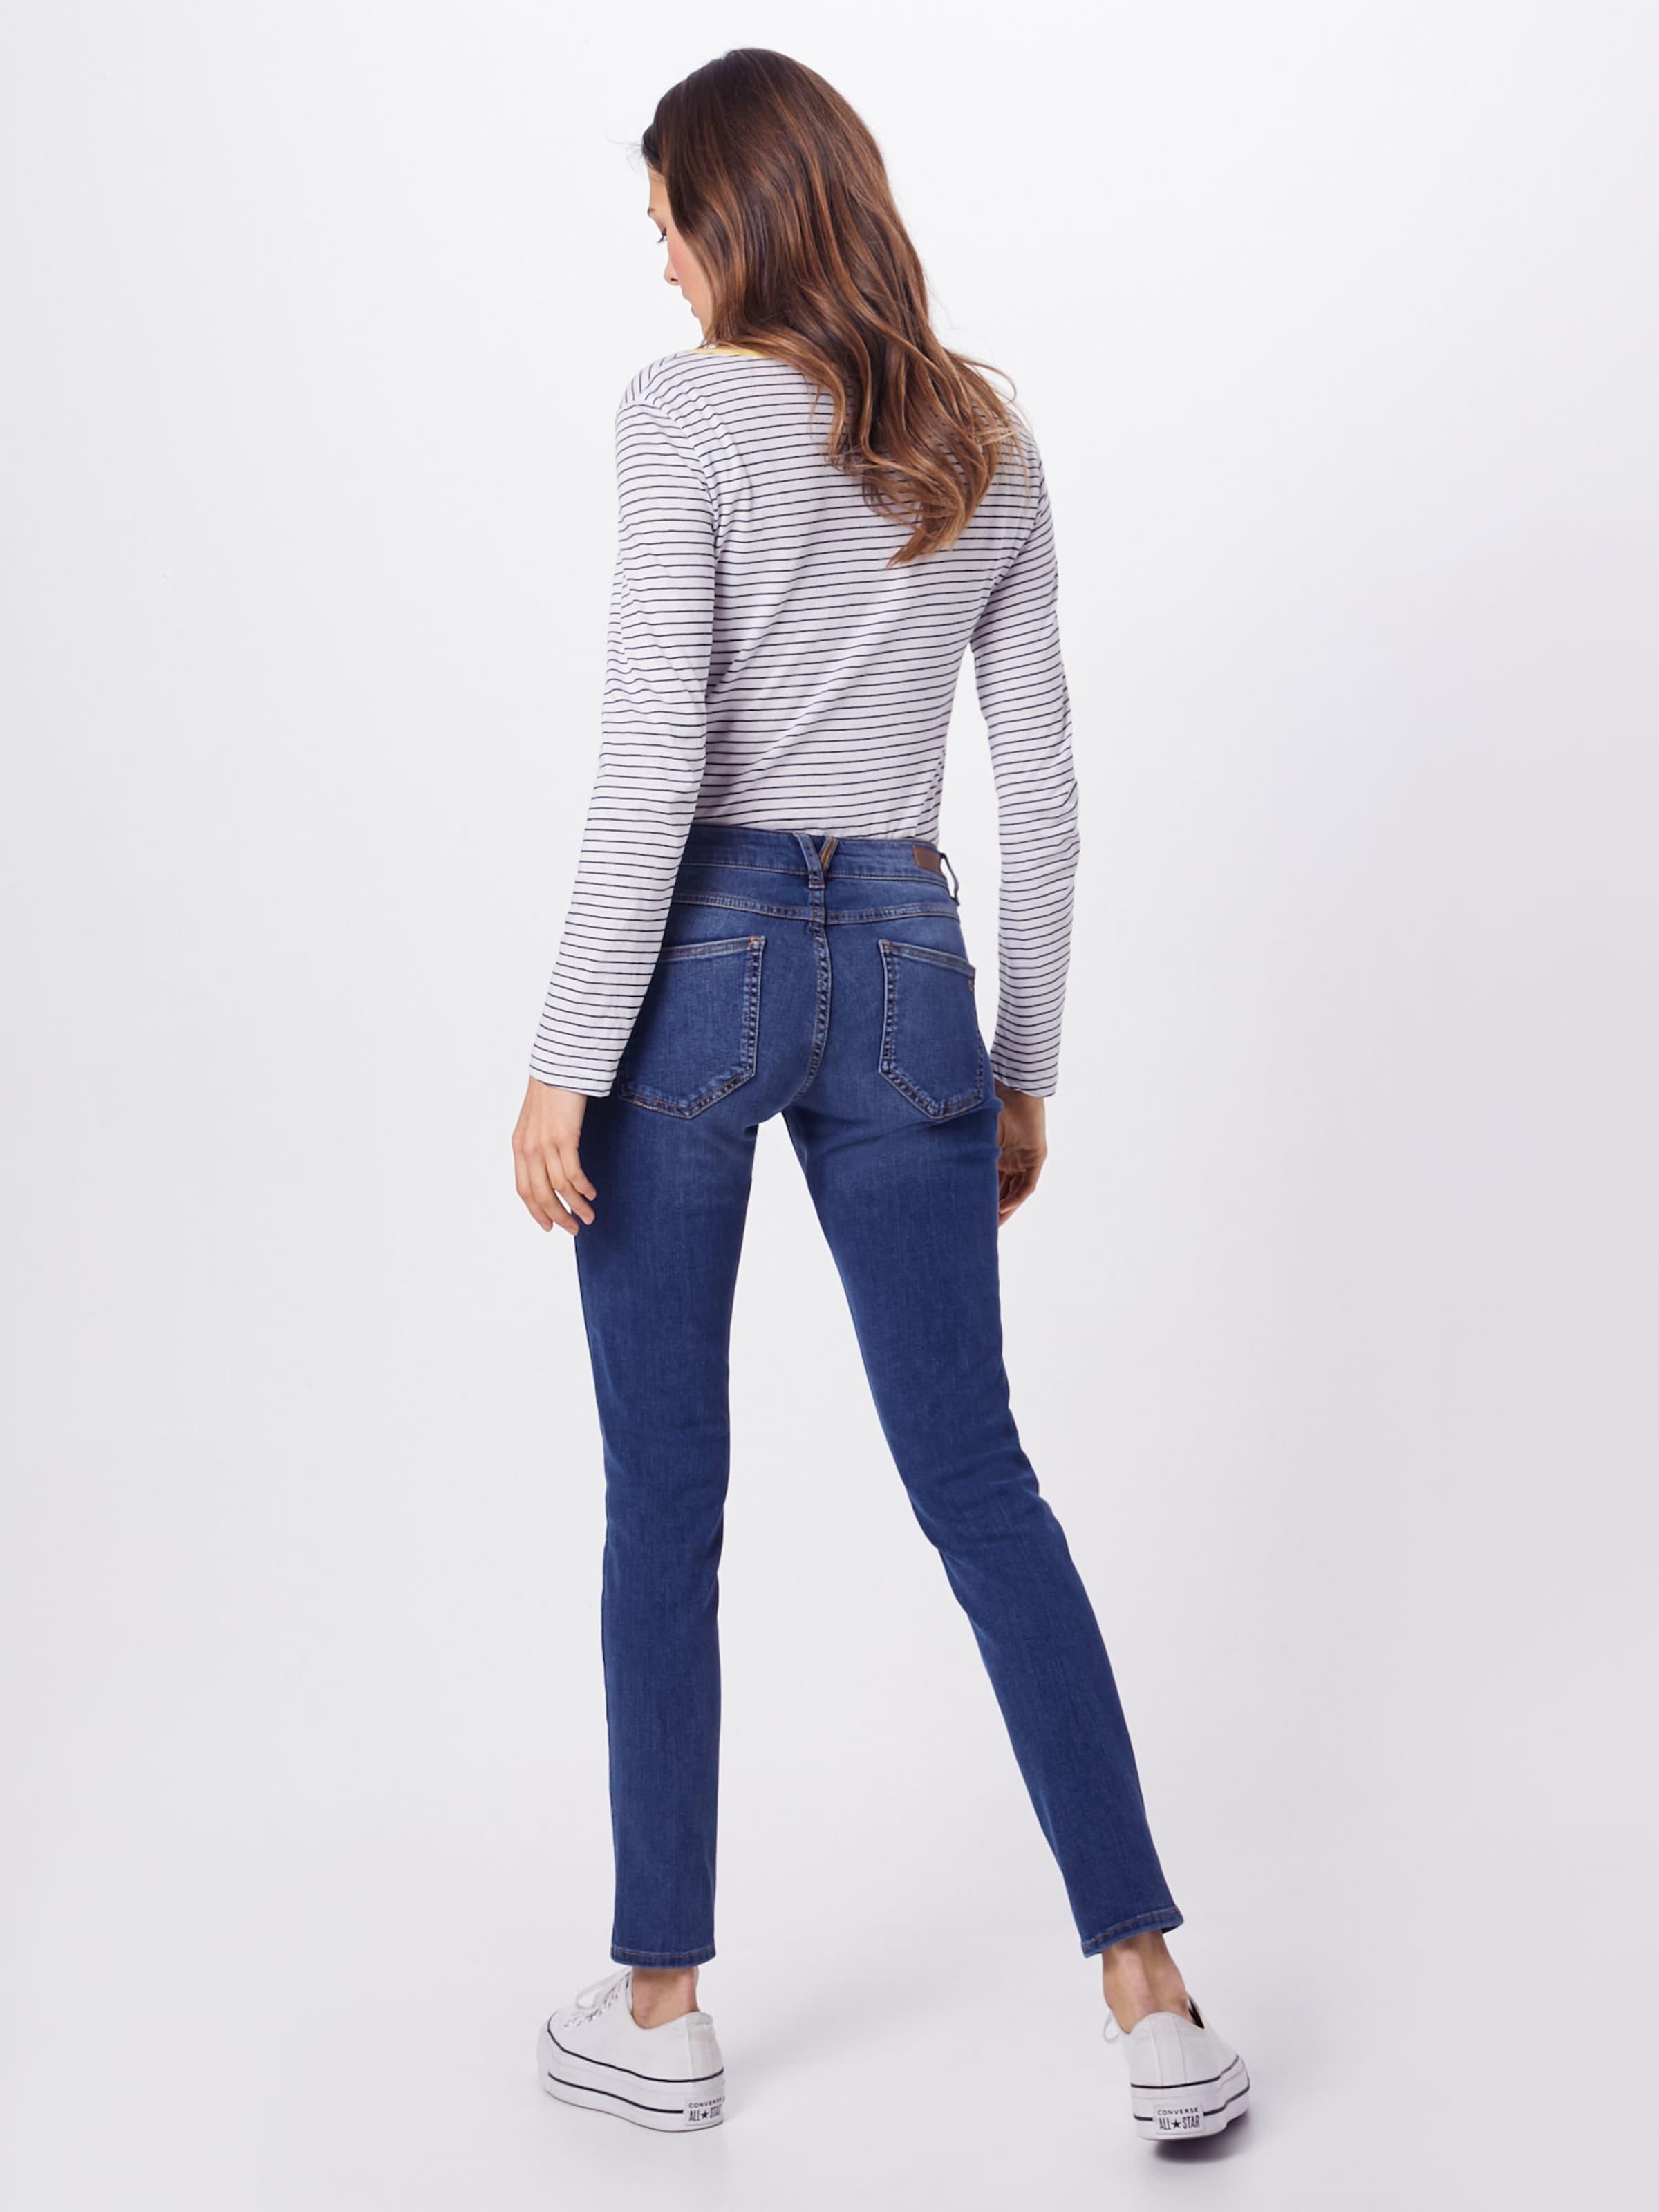 S oliver Bleu Superskinny' Denim Red Label Jean 'shape En kXZOPiu